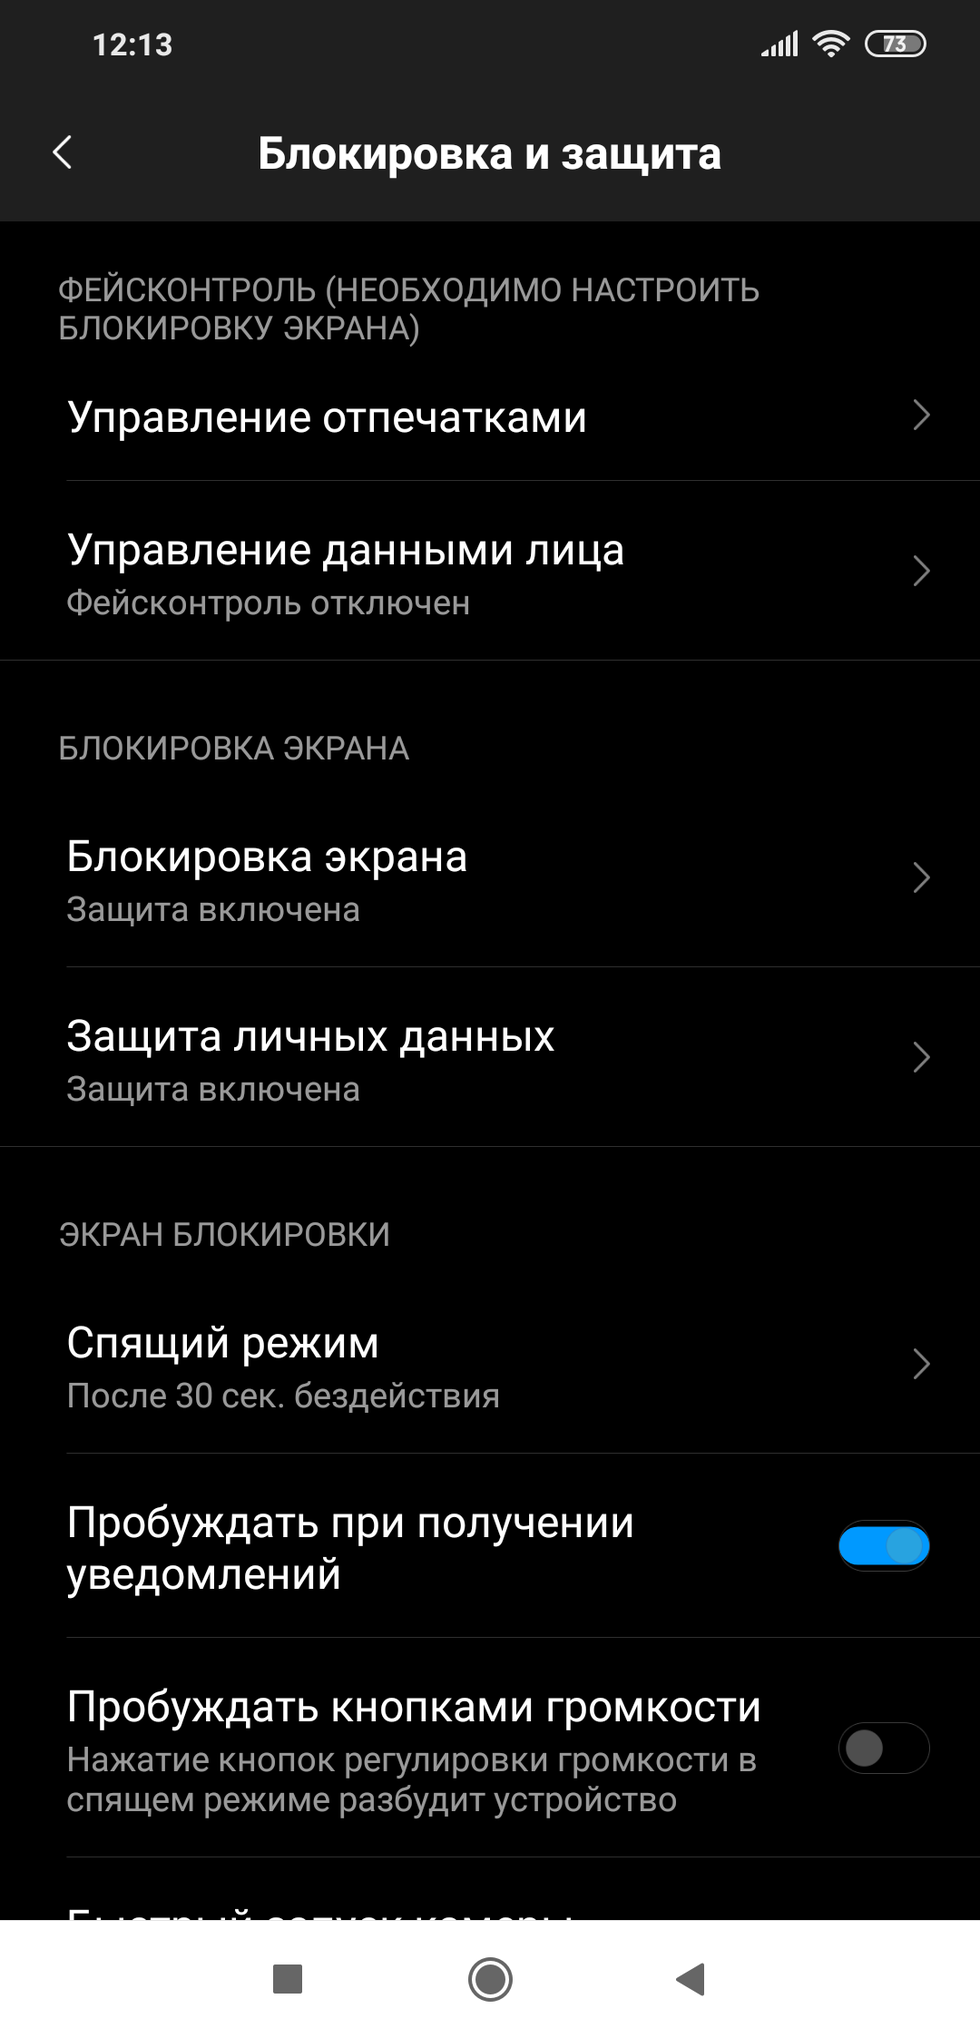 Screenshot_2019-01-12-12-13-22-303_com.android.settings.png